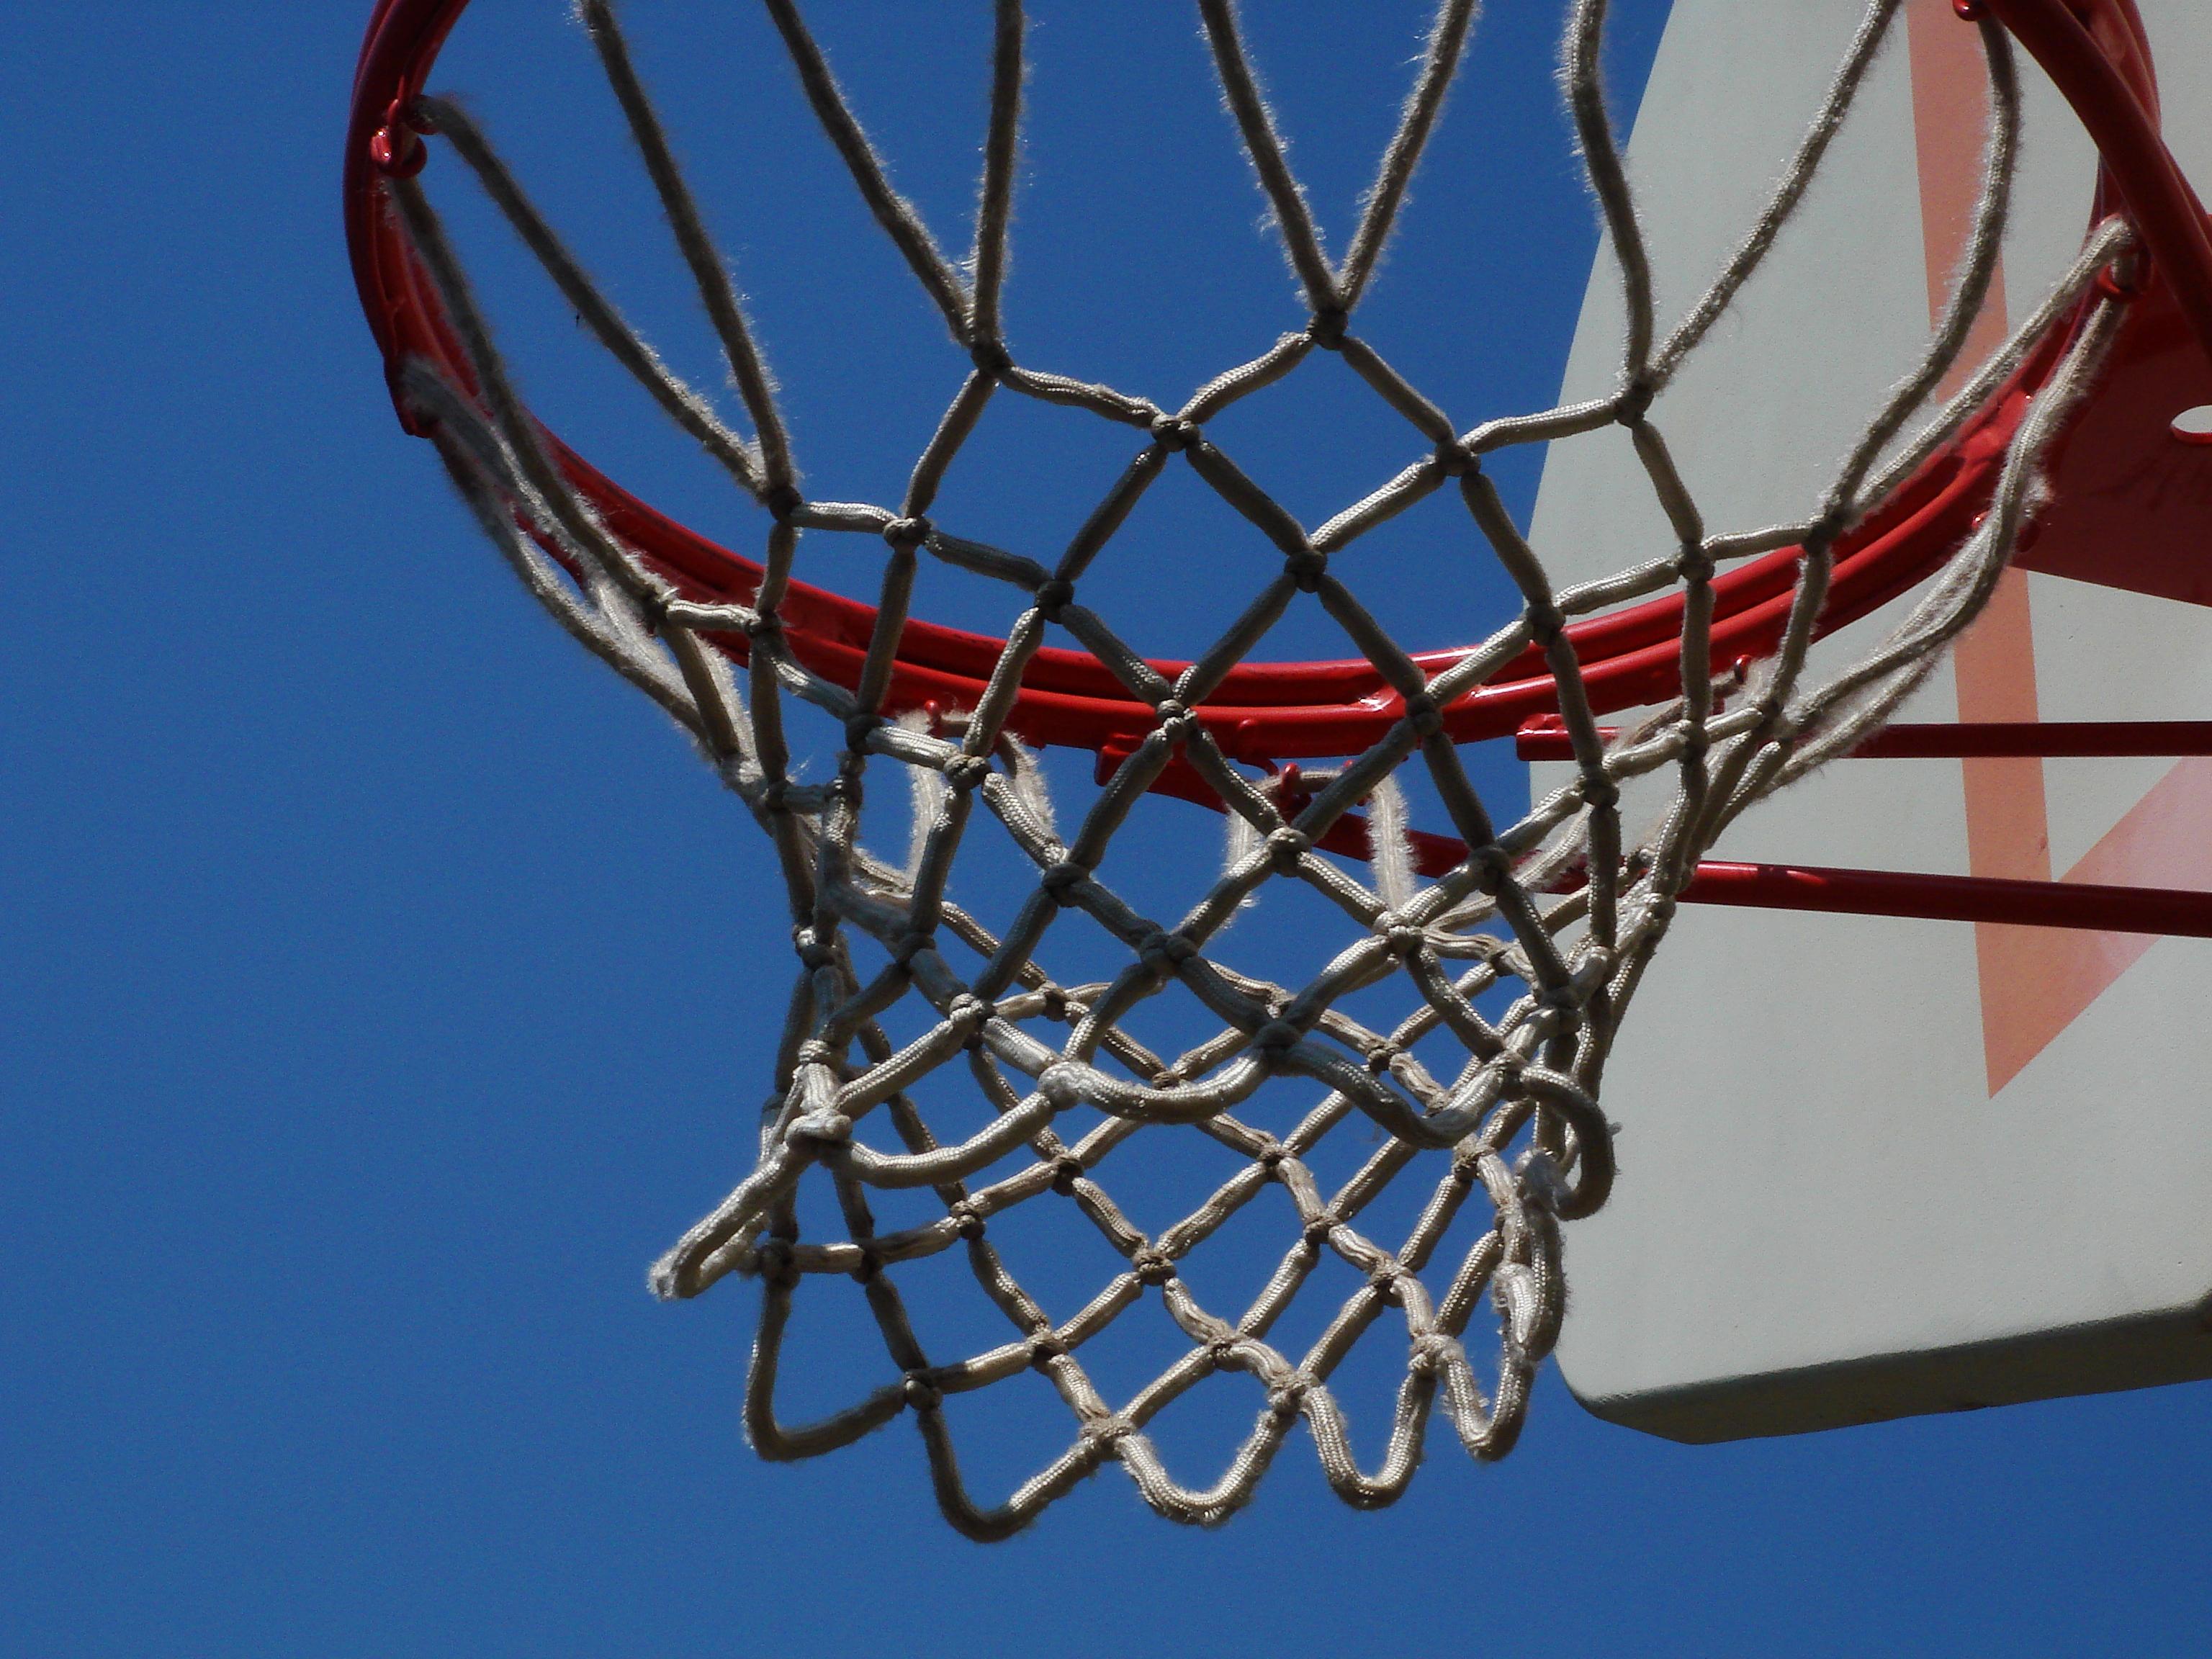 File:Basketball hoop.jpg - Wikimedia Commons